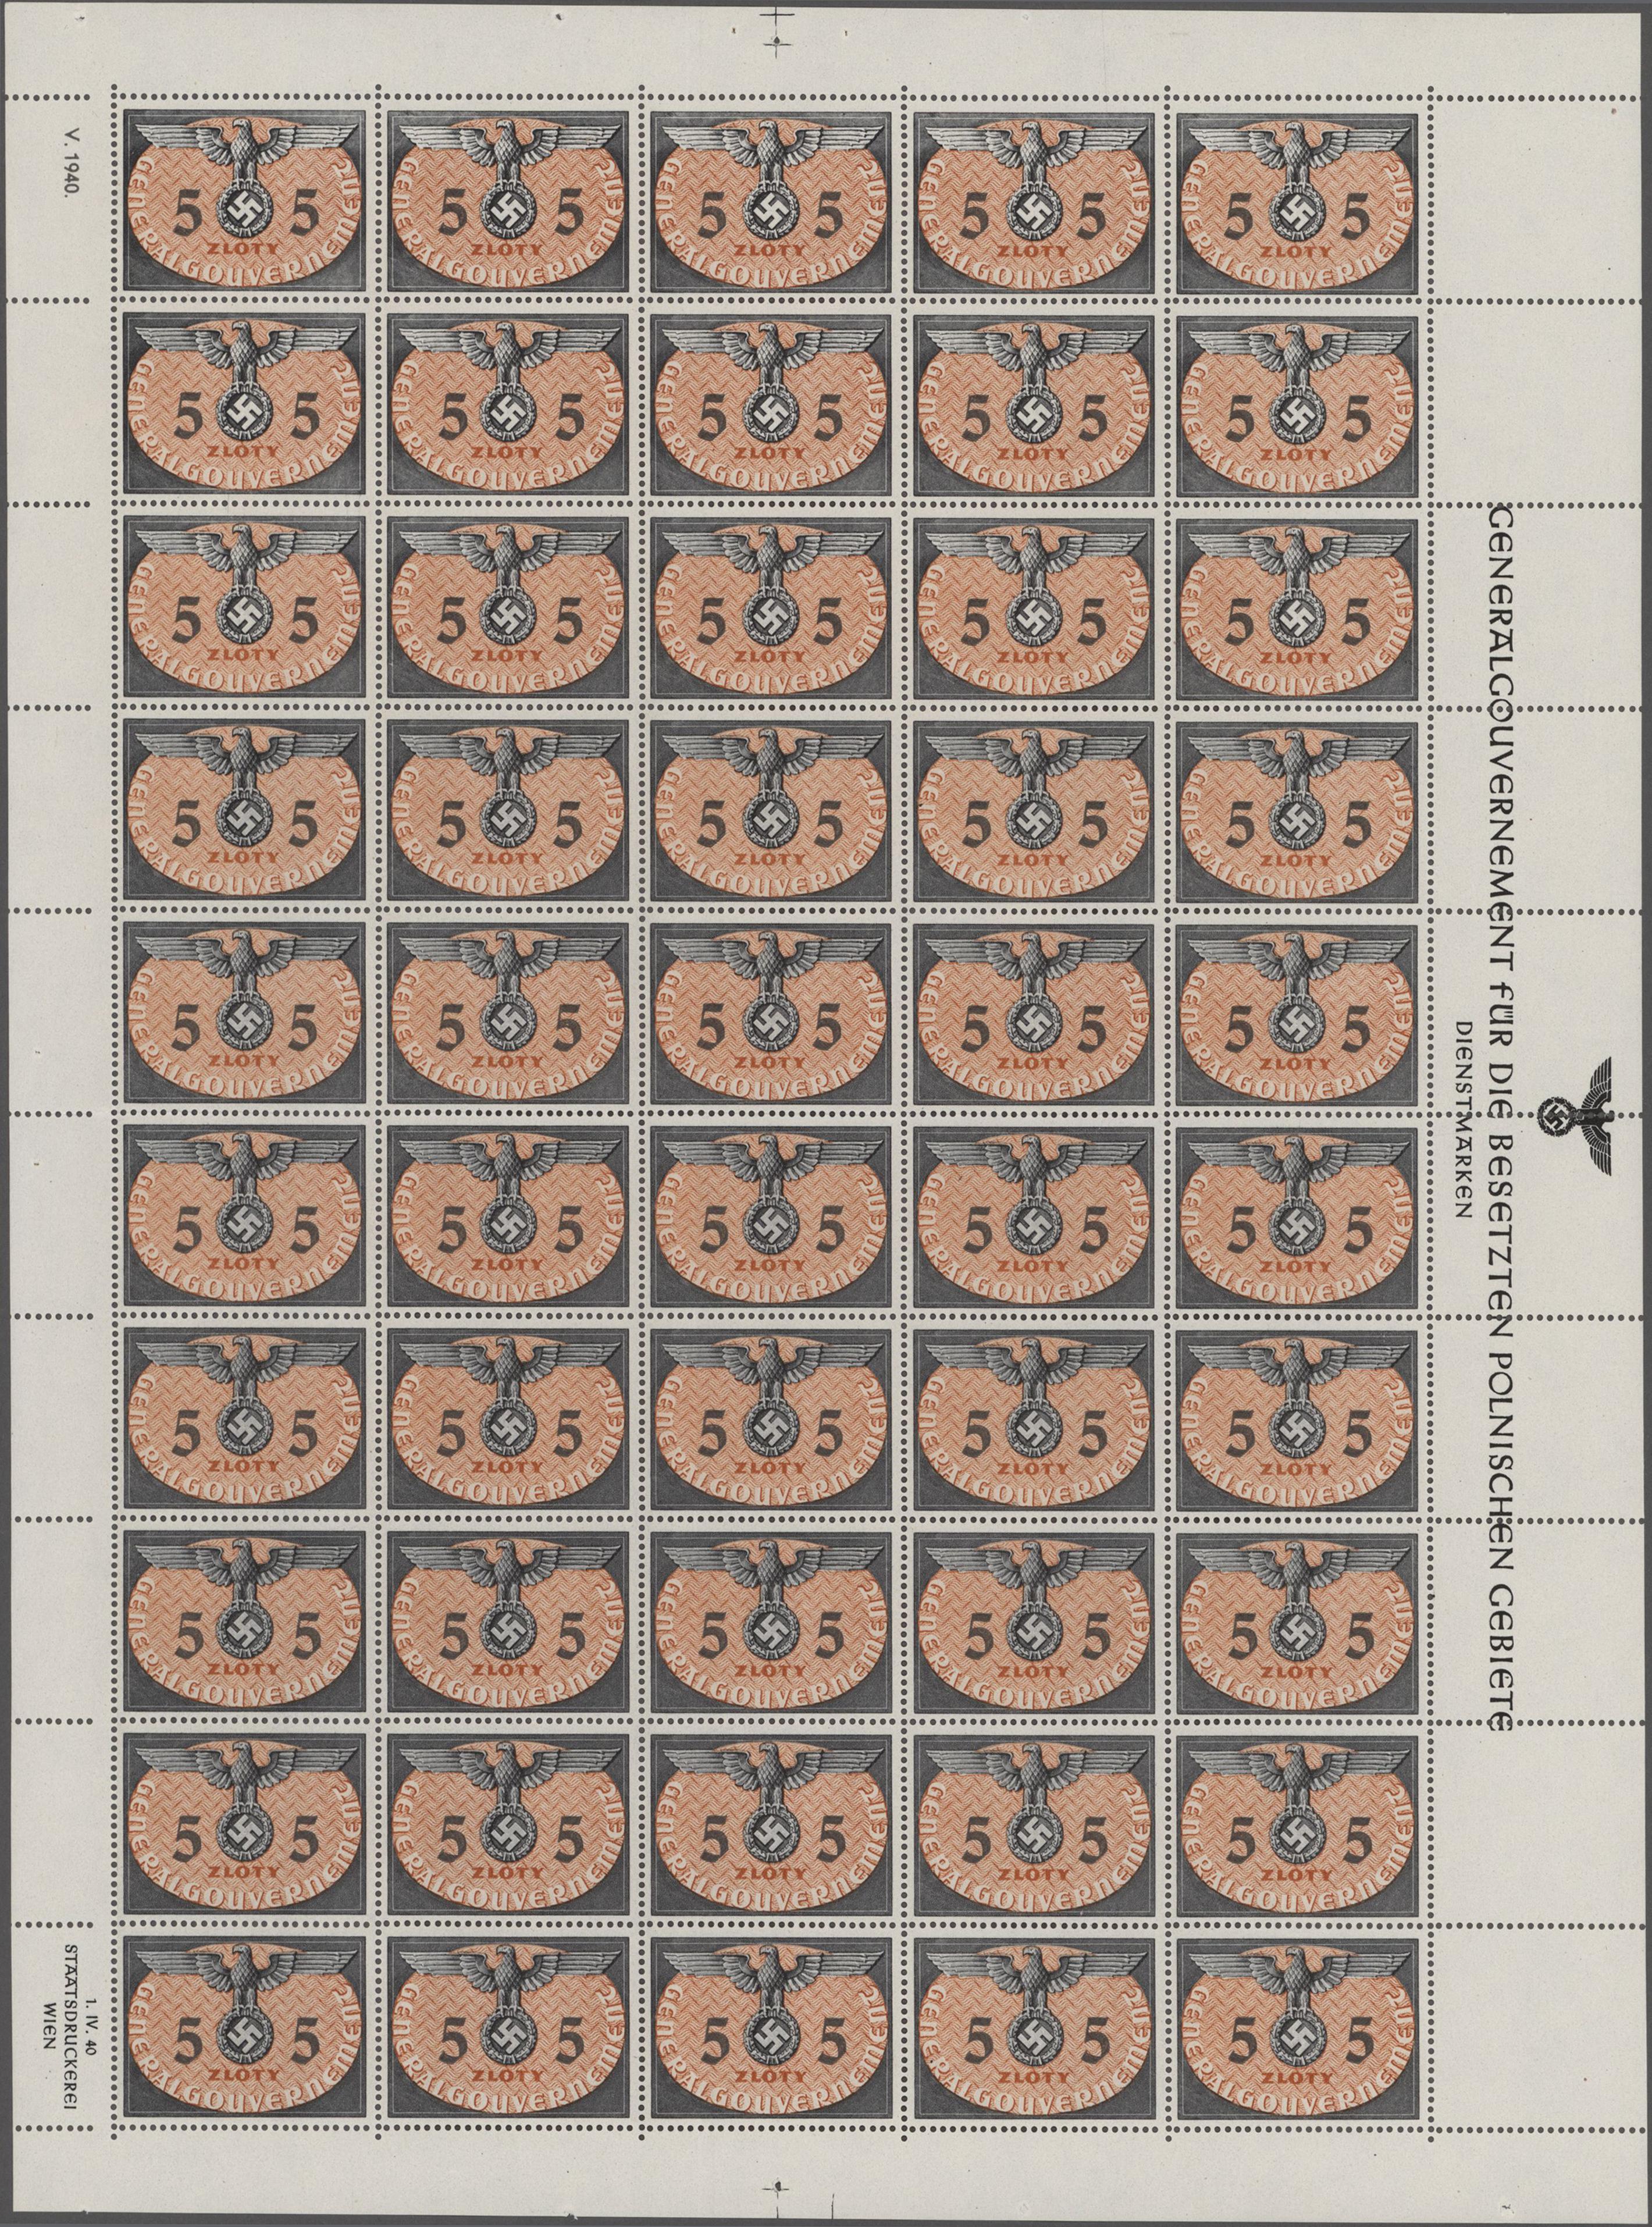 Lot 24917 - Dt. Besetzung II WK - Generalgouvernement - Dienstmarken  -  Auktionshaus Christoph Gärtner GmbH & Co. KG Sale #47 Colections: Germany